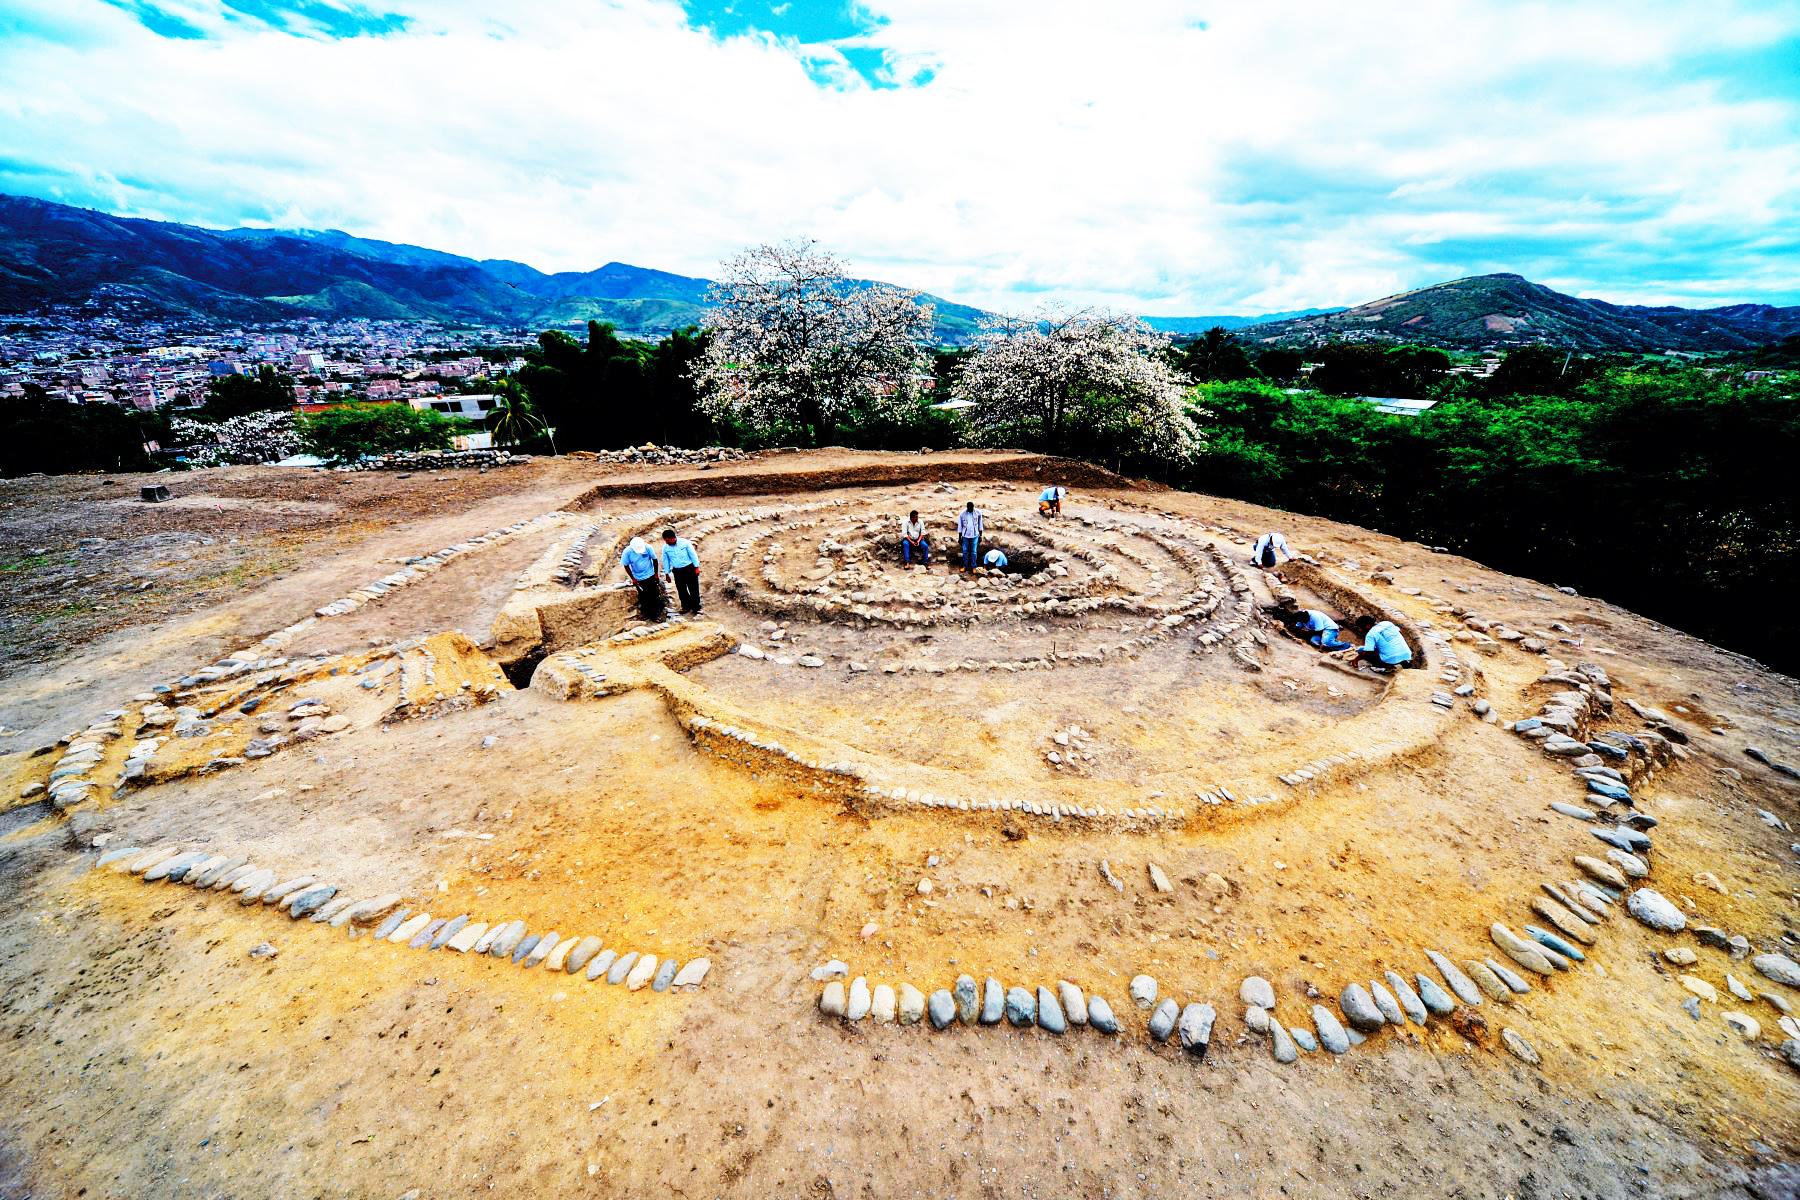 kỳ quan Mayo Chinchipe Marañón Archaeological Landscape, Ecuador